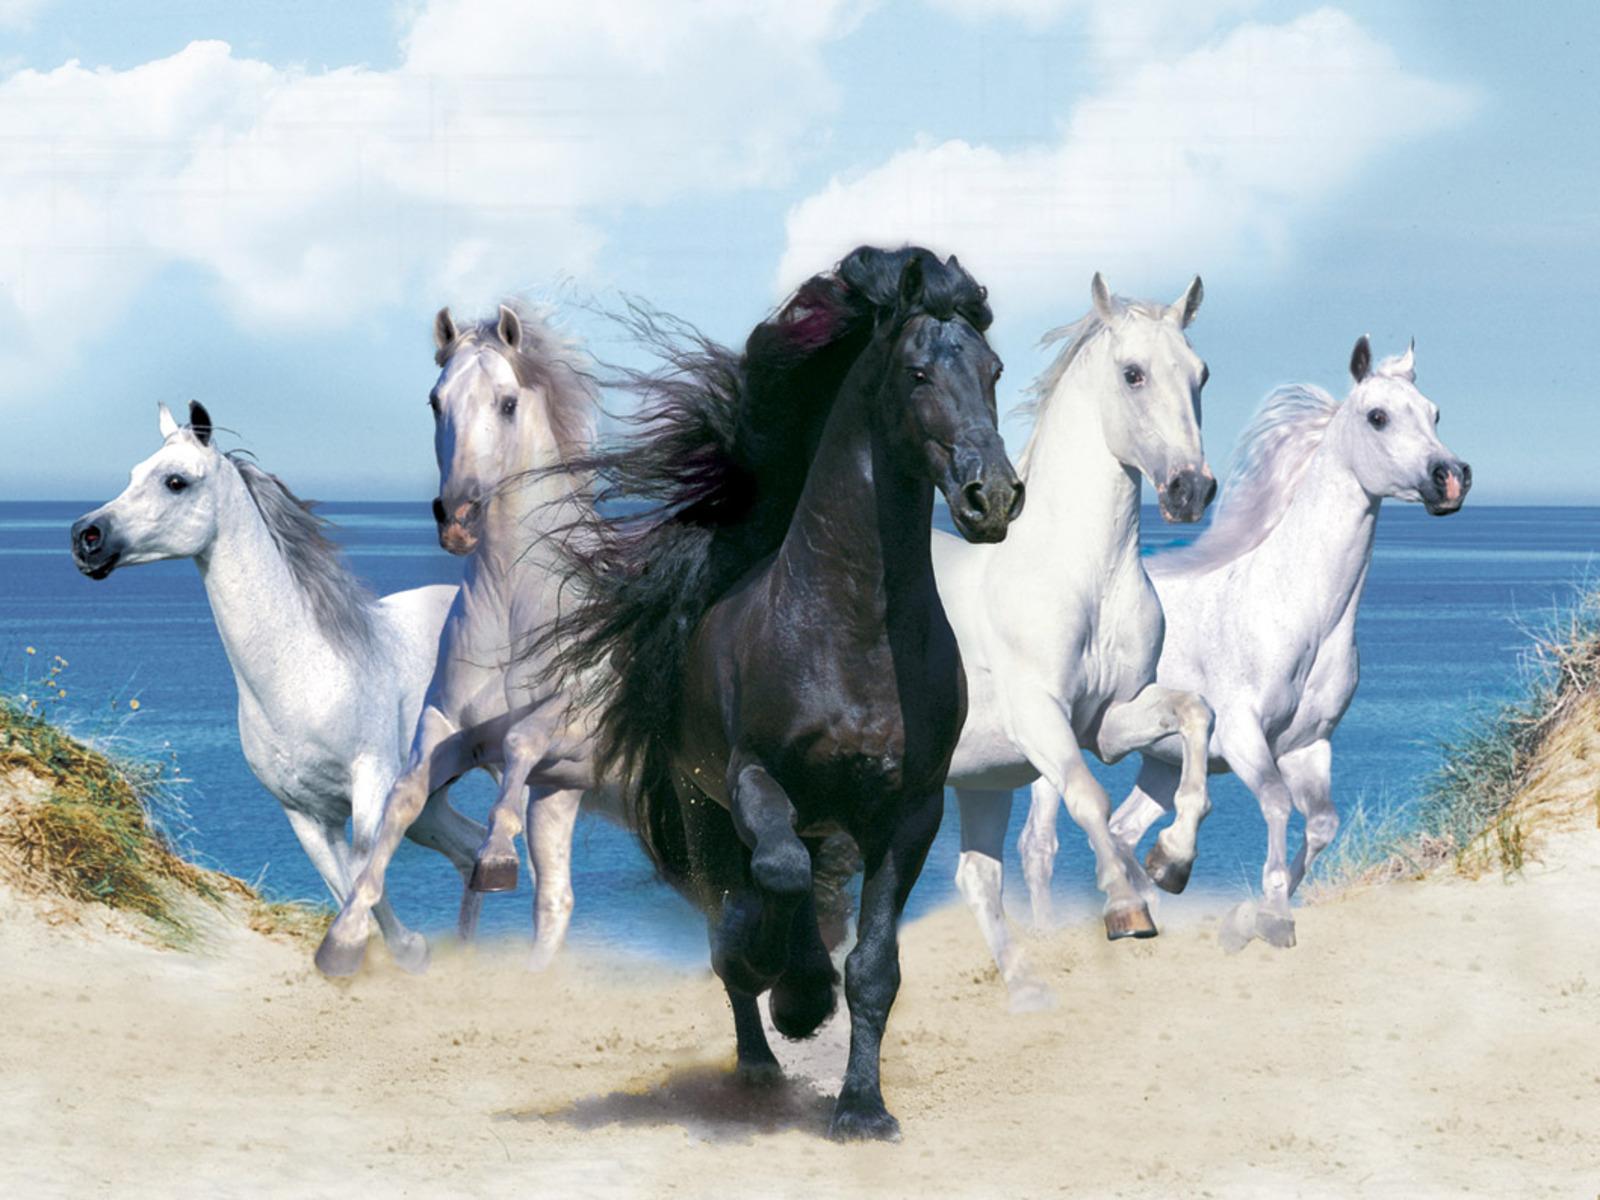 41 Horses Pictures Wallpaper On Wallpapersafari